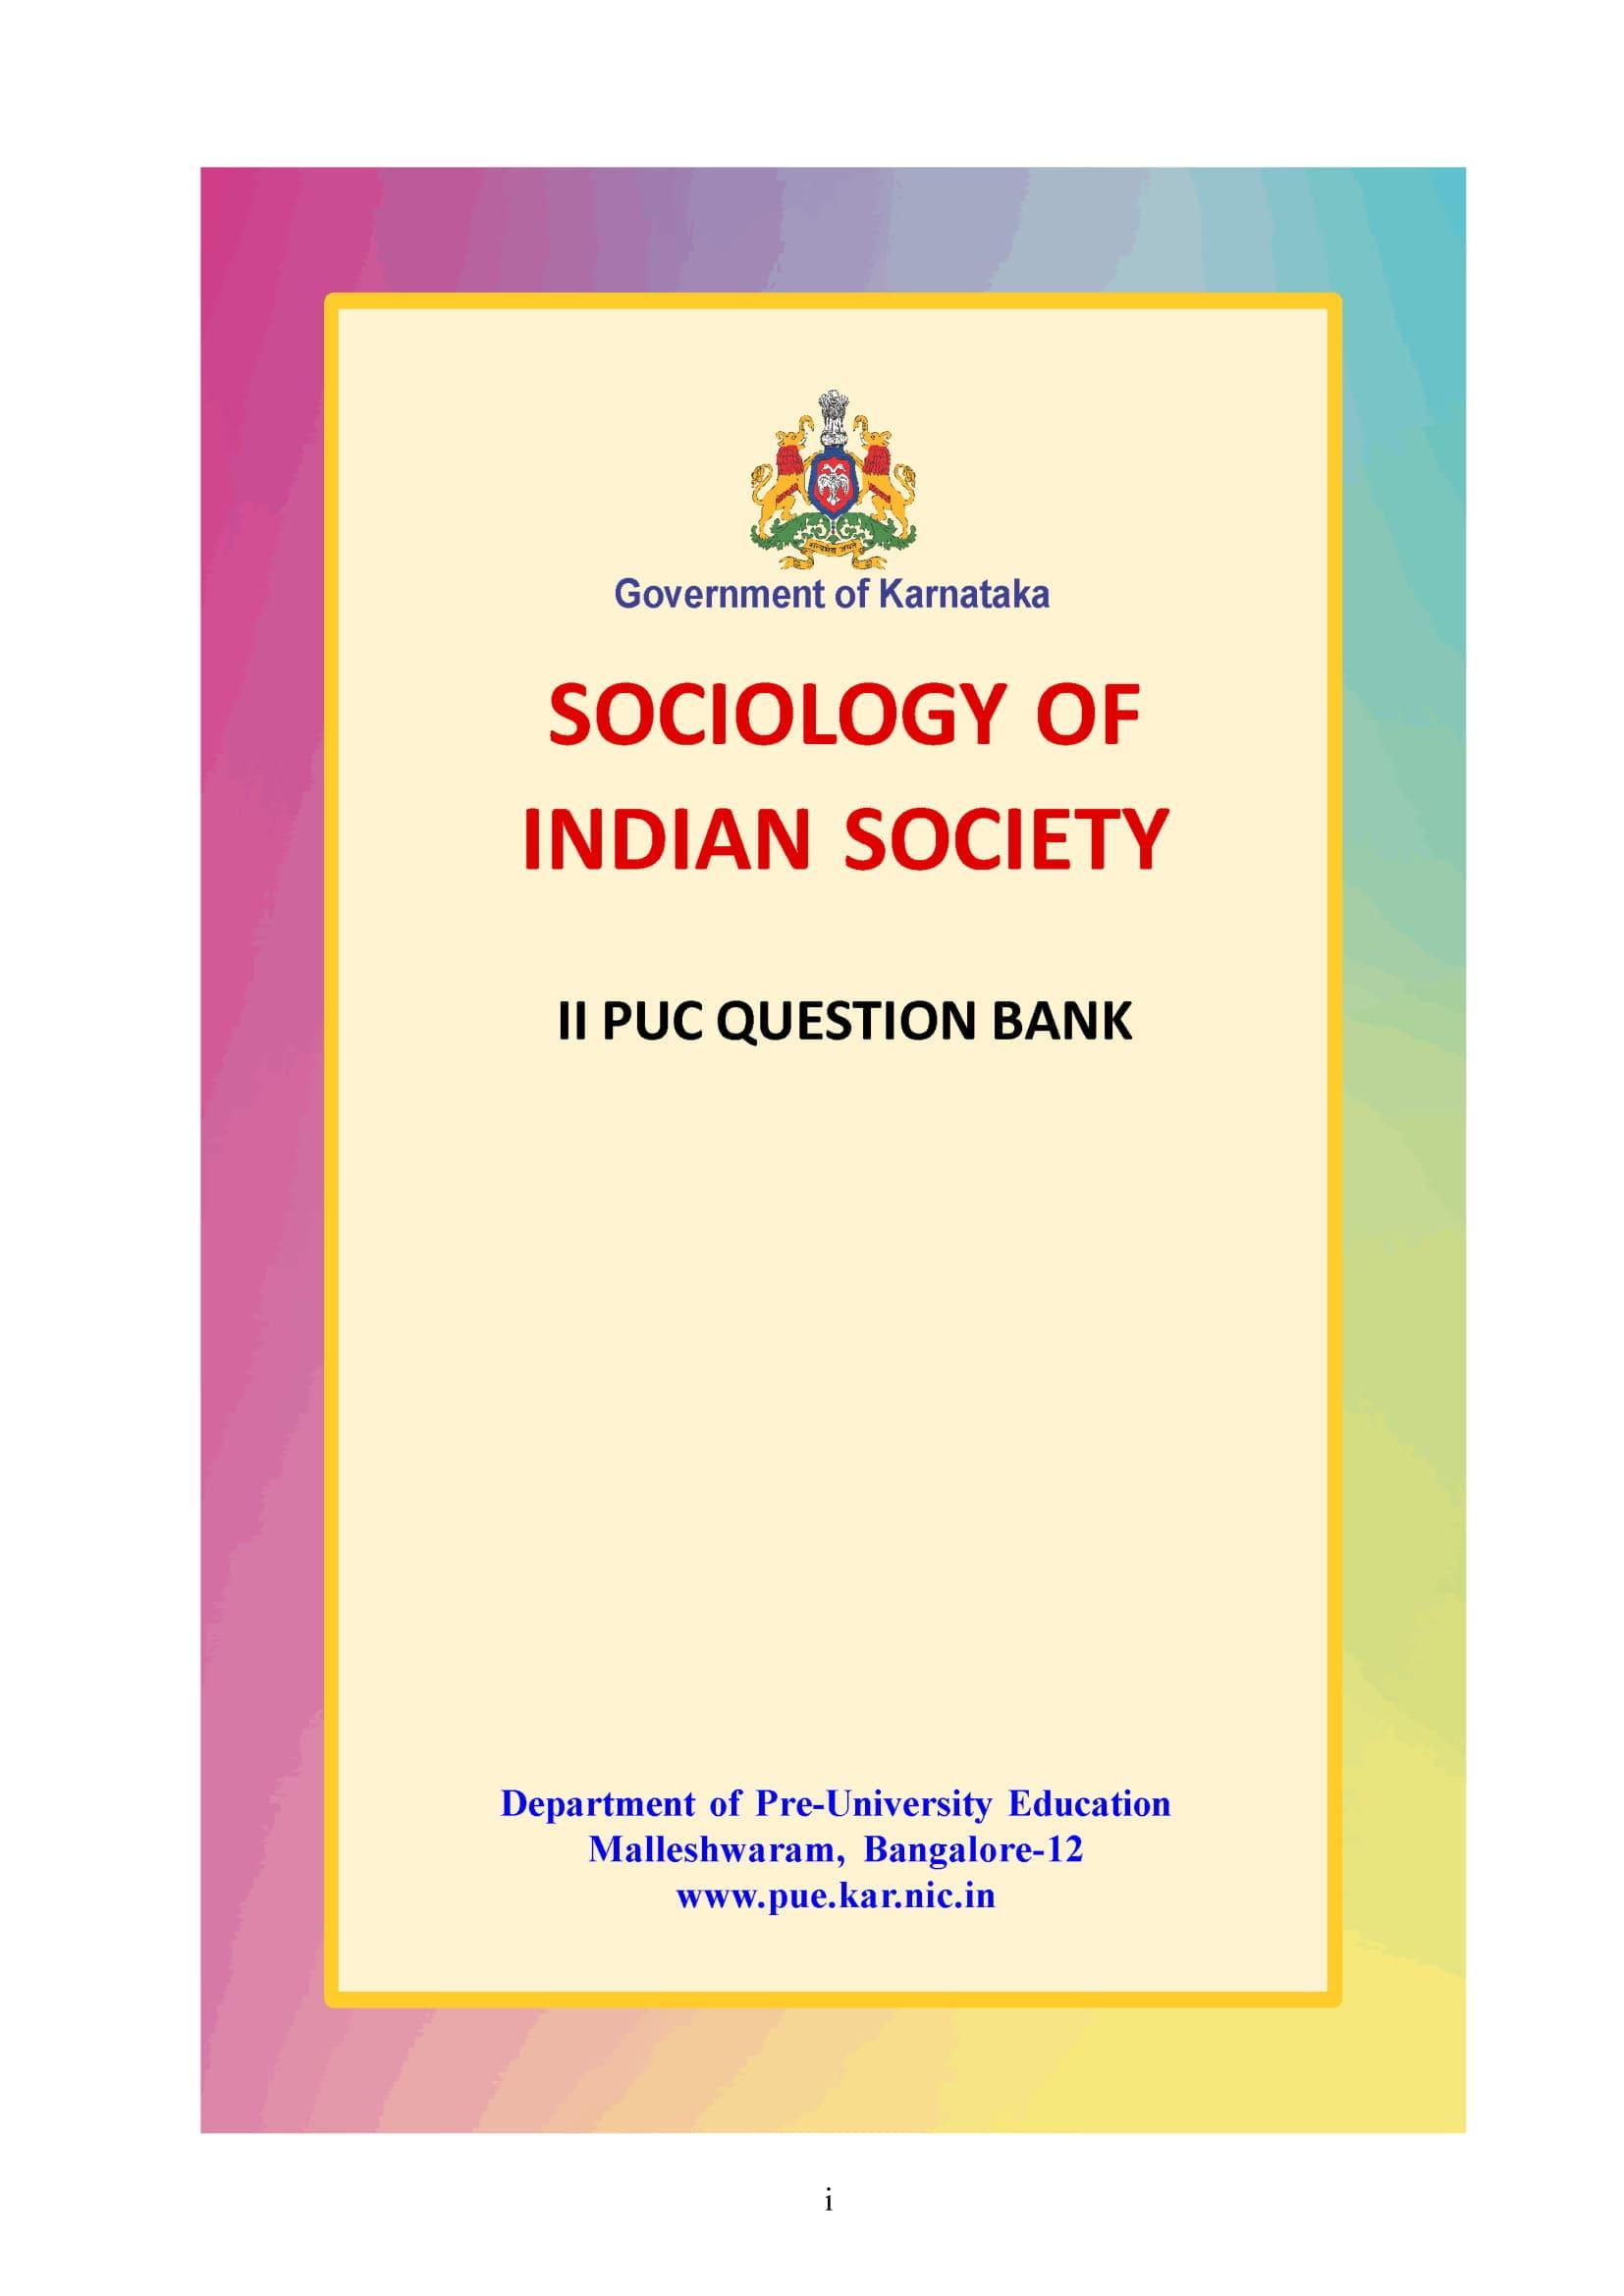 Karnataka 2nd PUC Question Bank for Sociology 2017-18 - Page 1